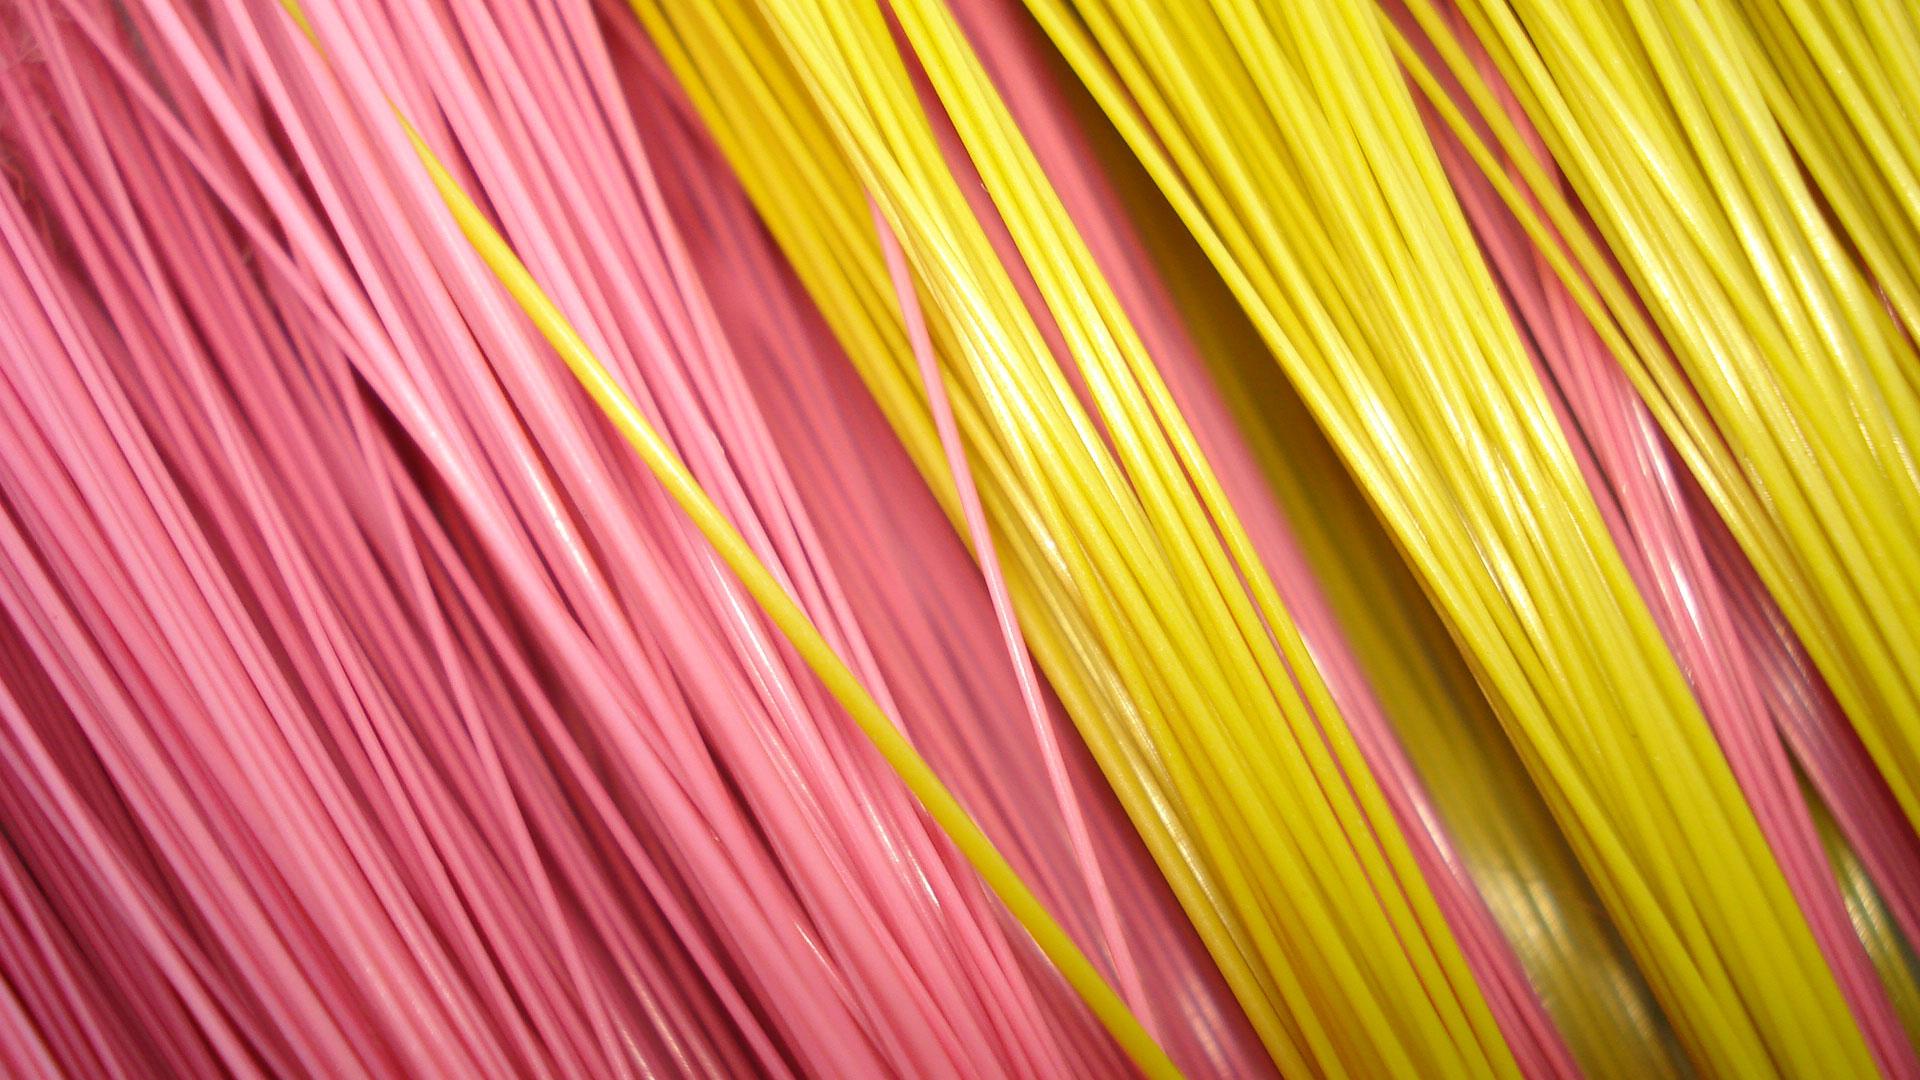 Hd wallpaper colour -  Colourful Wallpaper